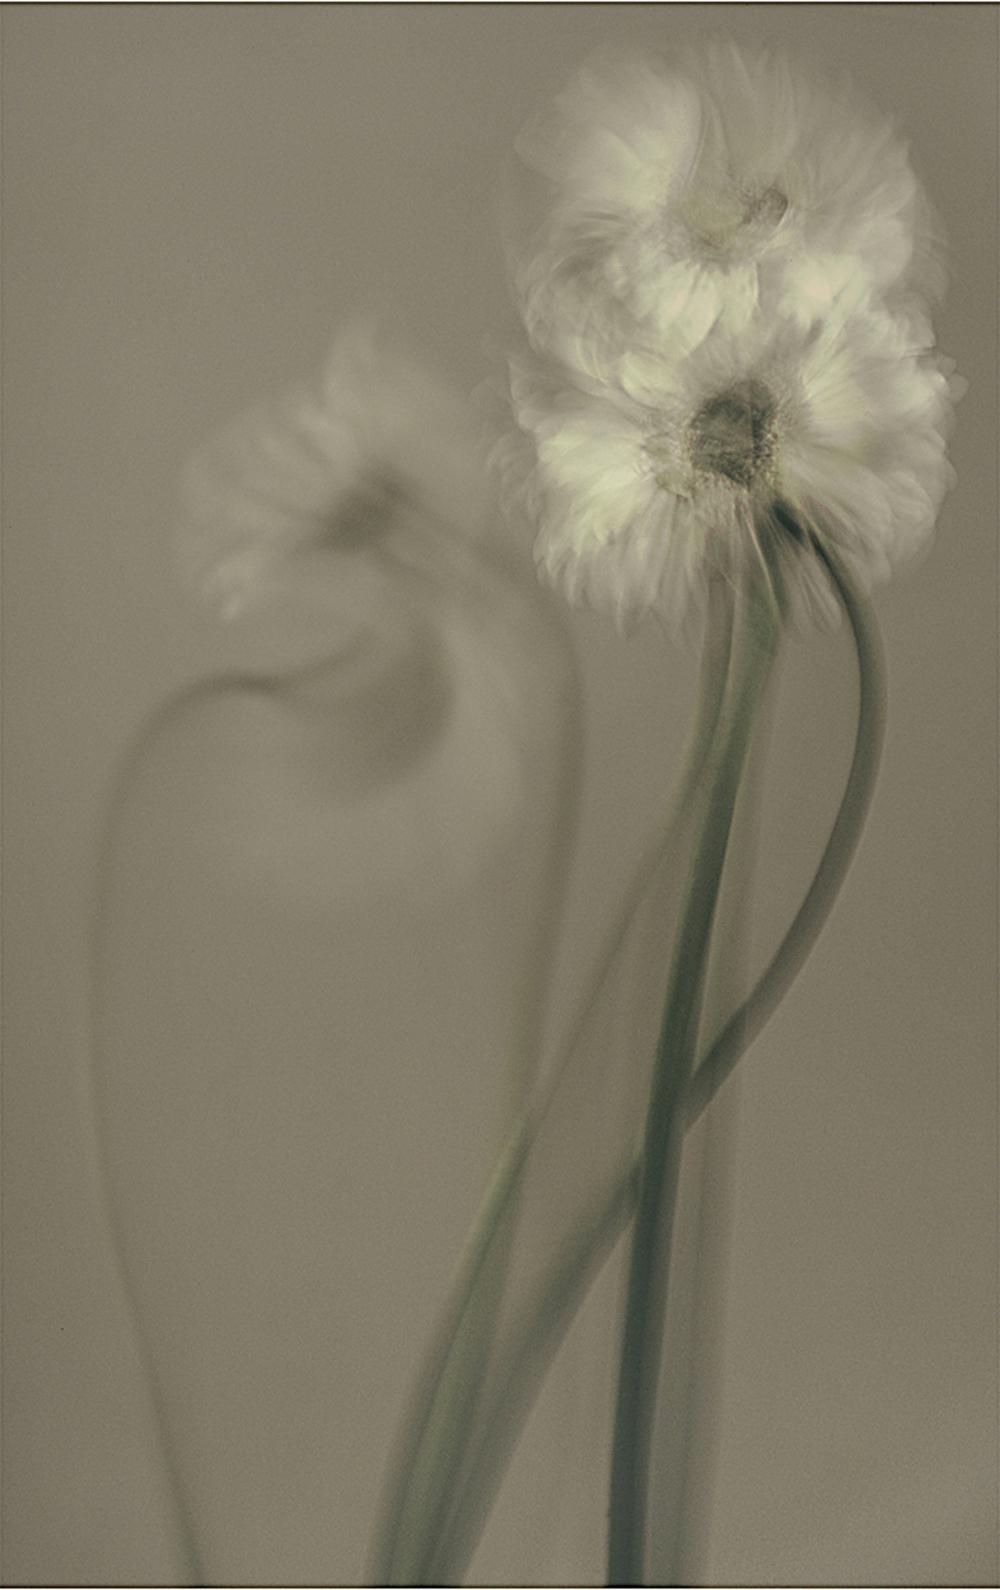 Derwish 11, Nasuhi,   2007 Cibachrome Photograph cm 196x122